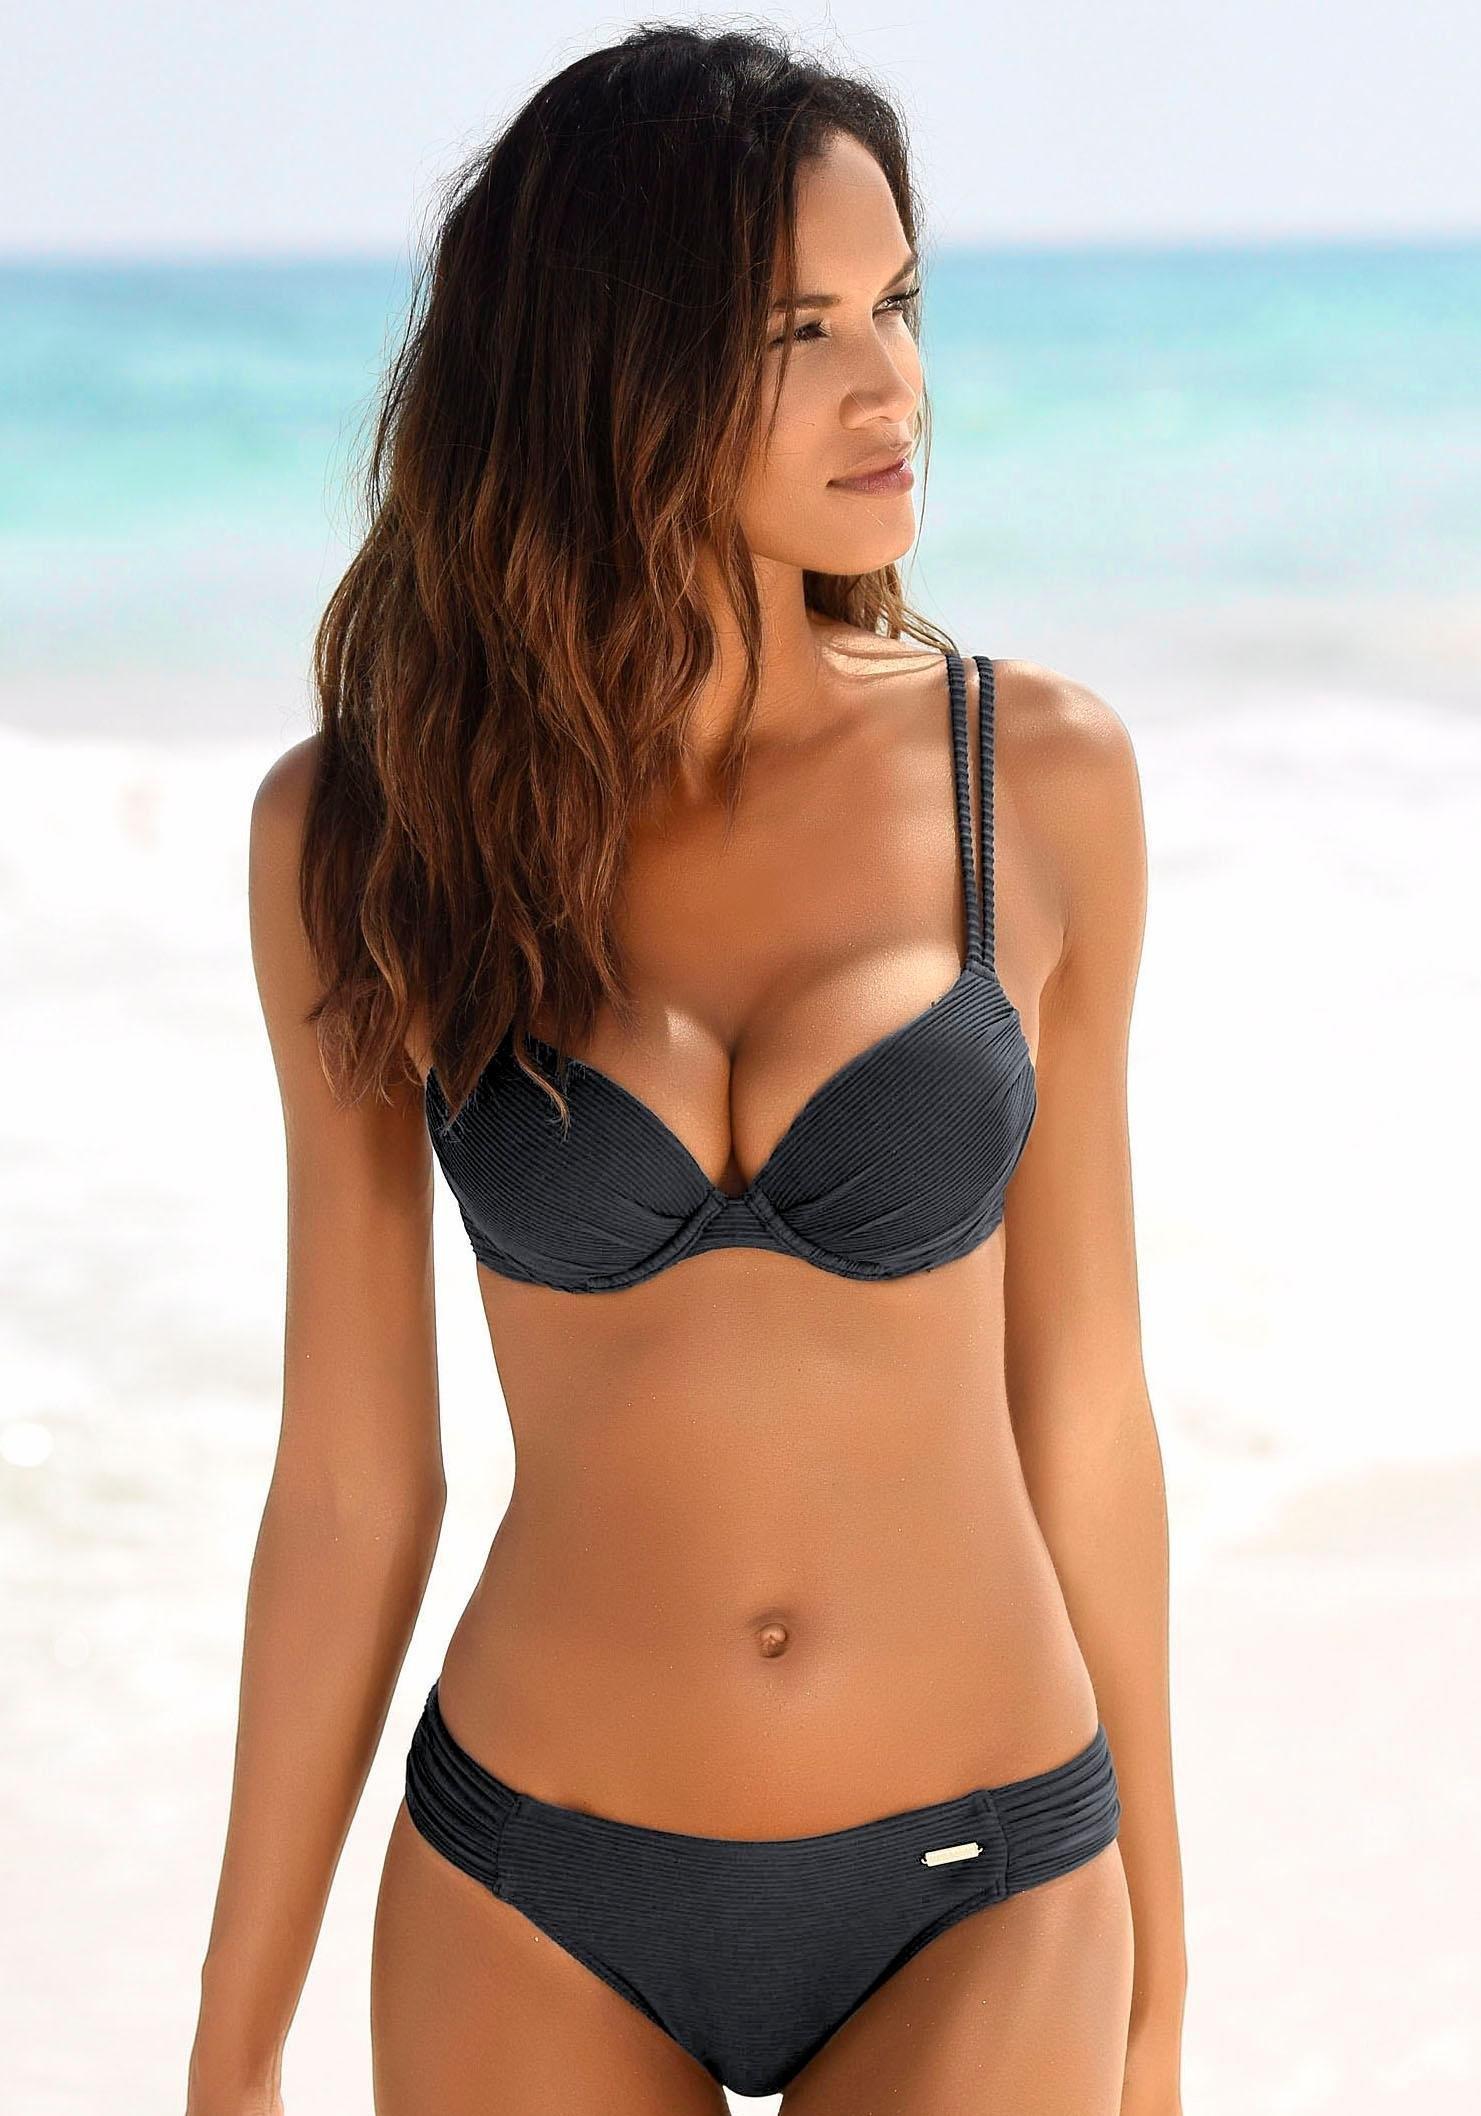 Sunseeker bikinibroekje »Fancy« met structuurdesign - gratis ruilen op otto.nl